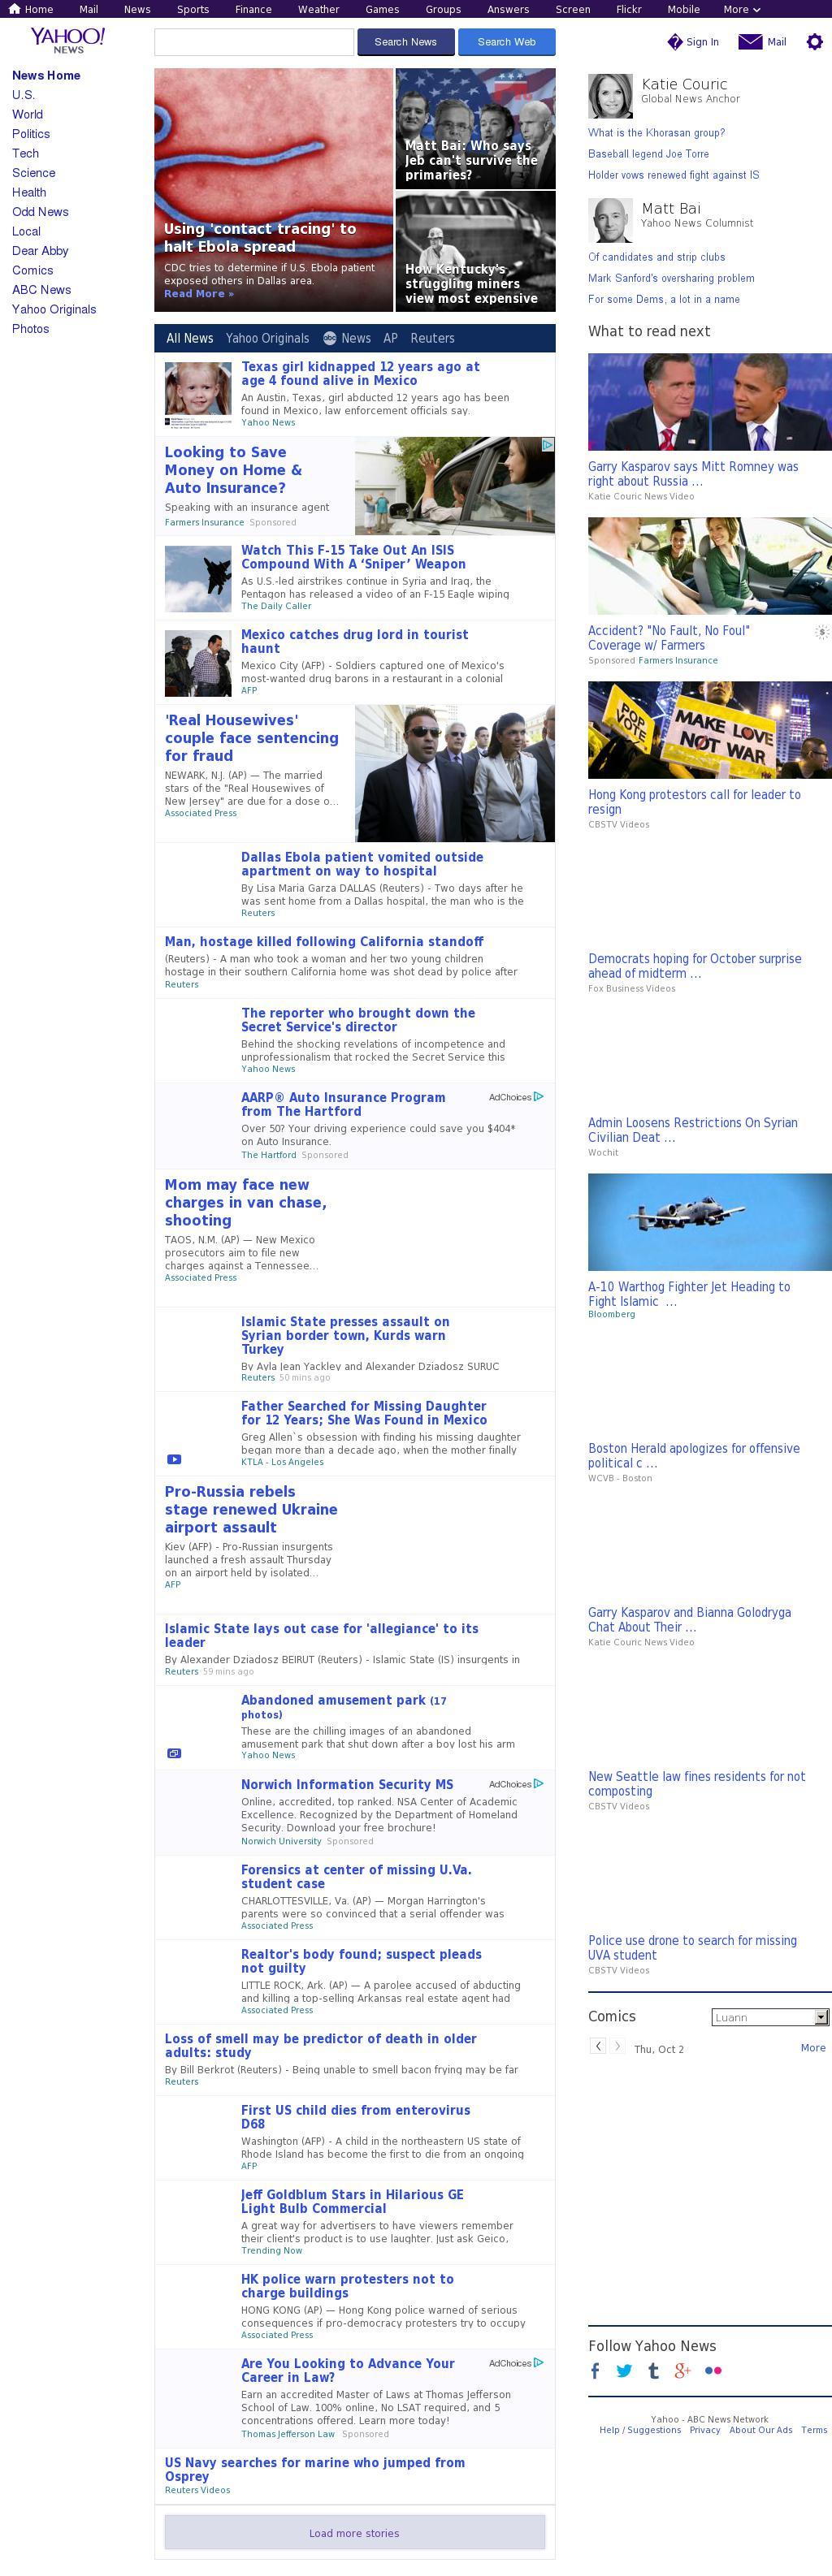 Yahoo! News at Thursday Oct. 2, 2014, 1:17 p.m. UTC